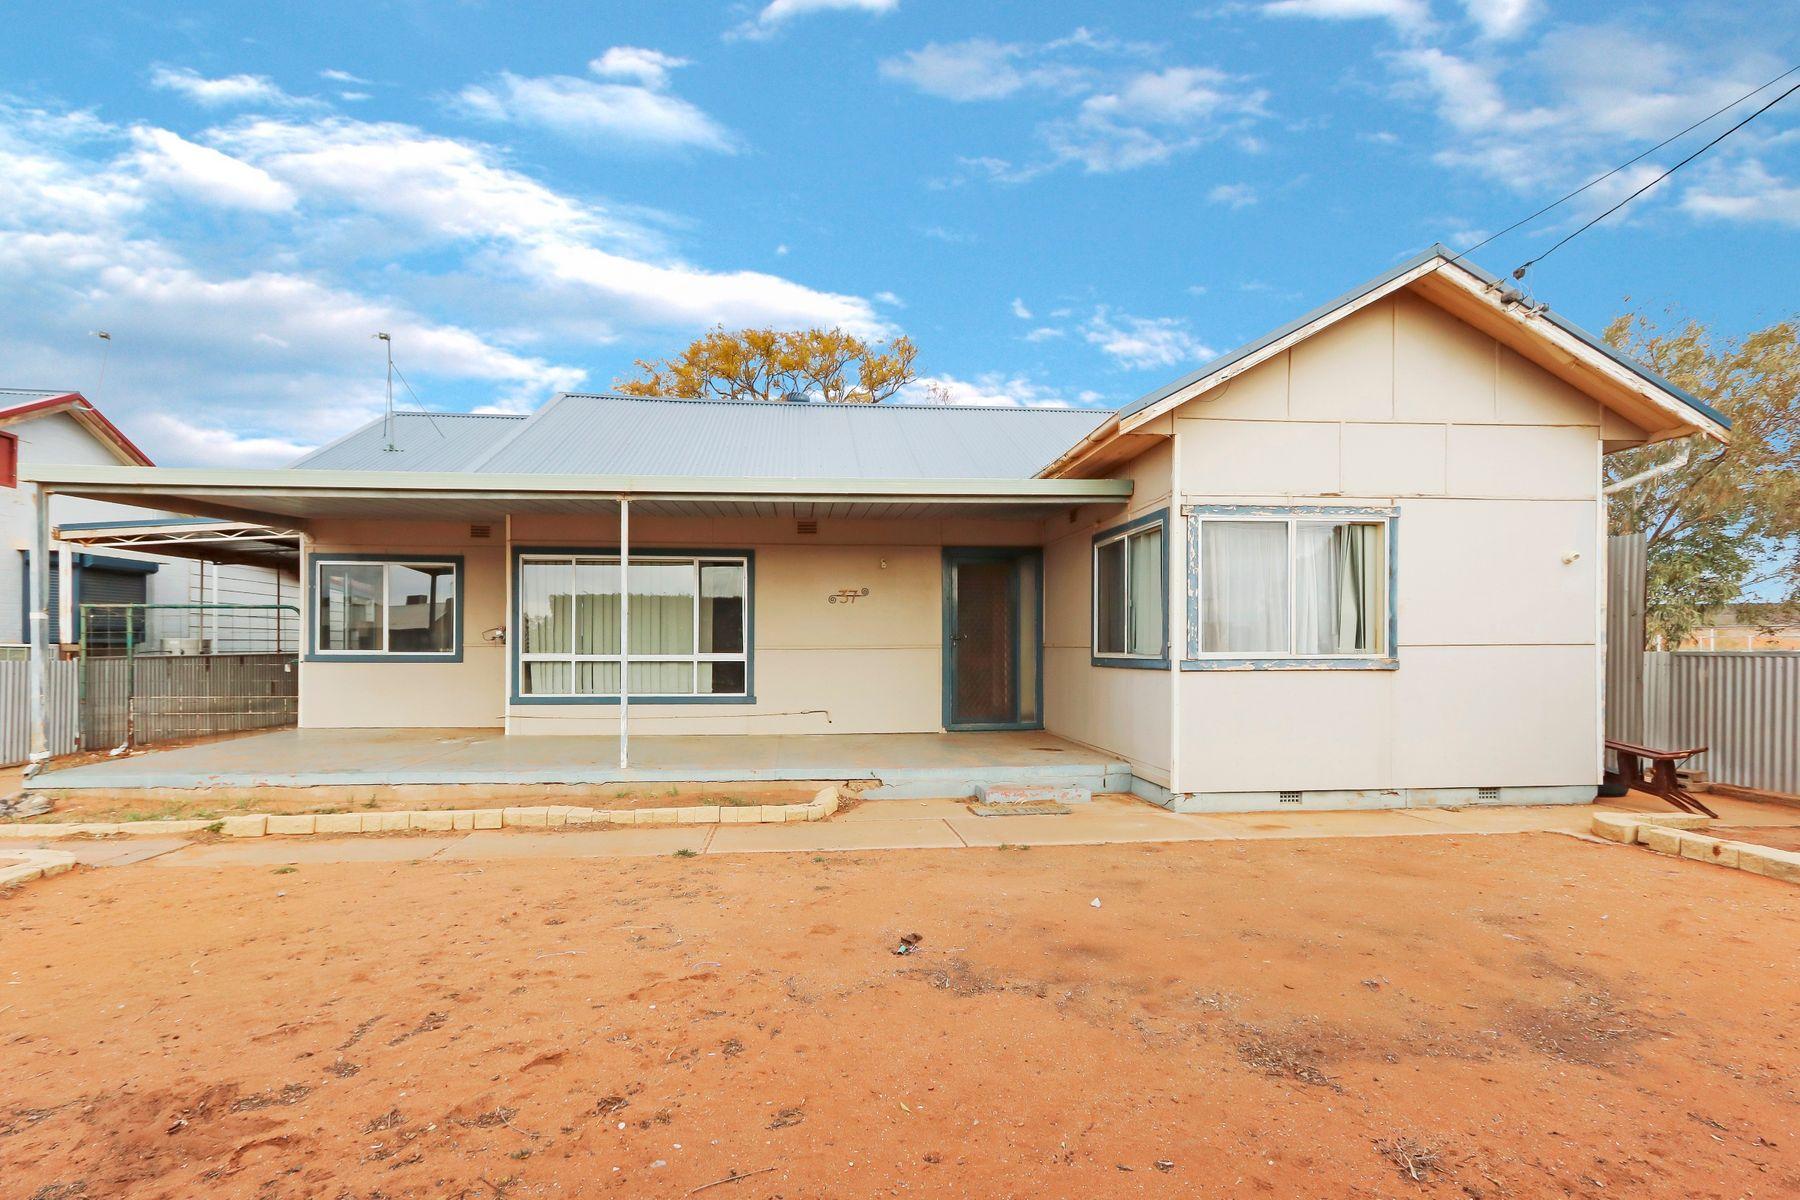 37 Gaffney Street, Broken Hill, NSW 2880